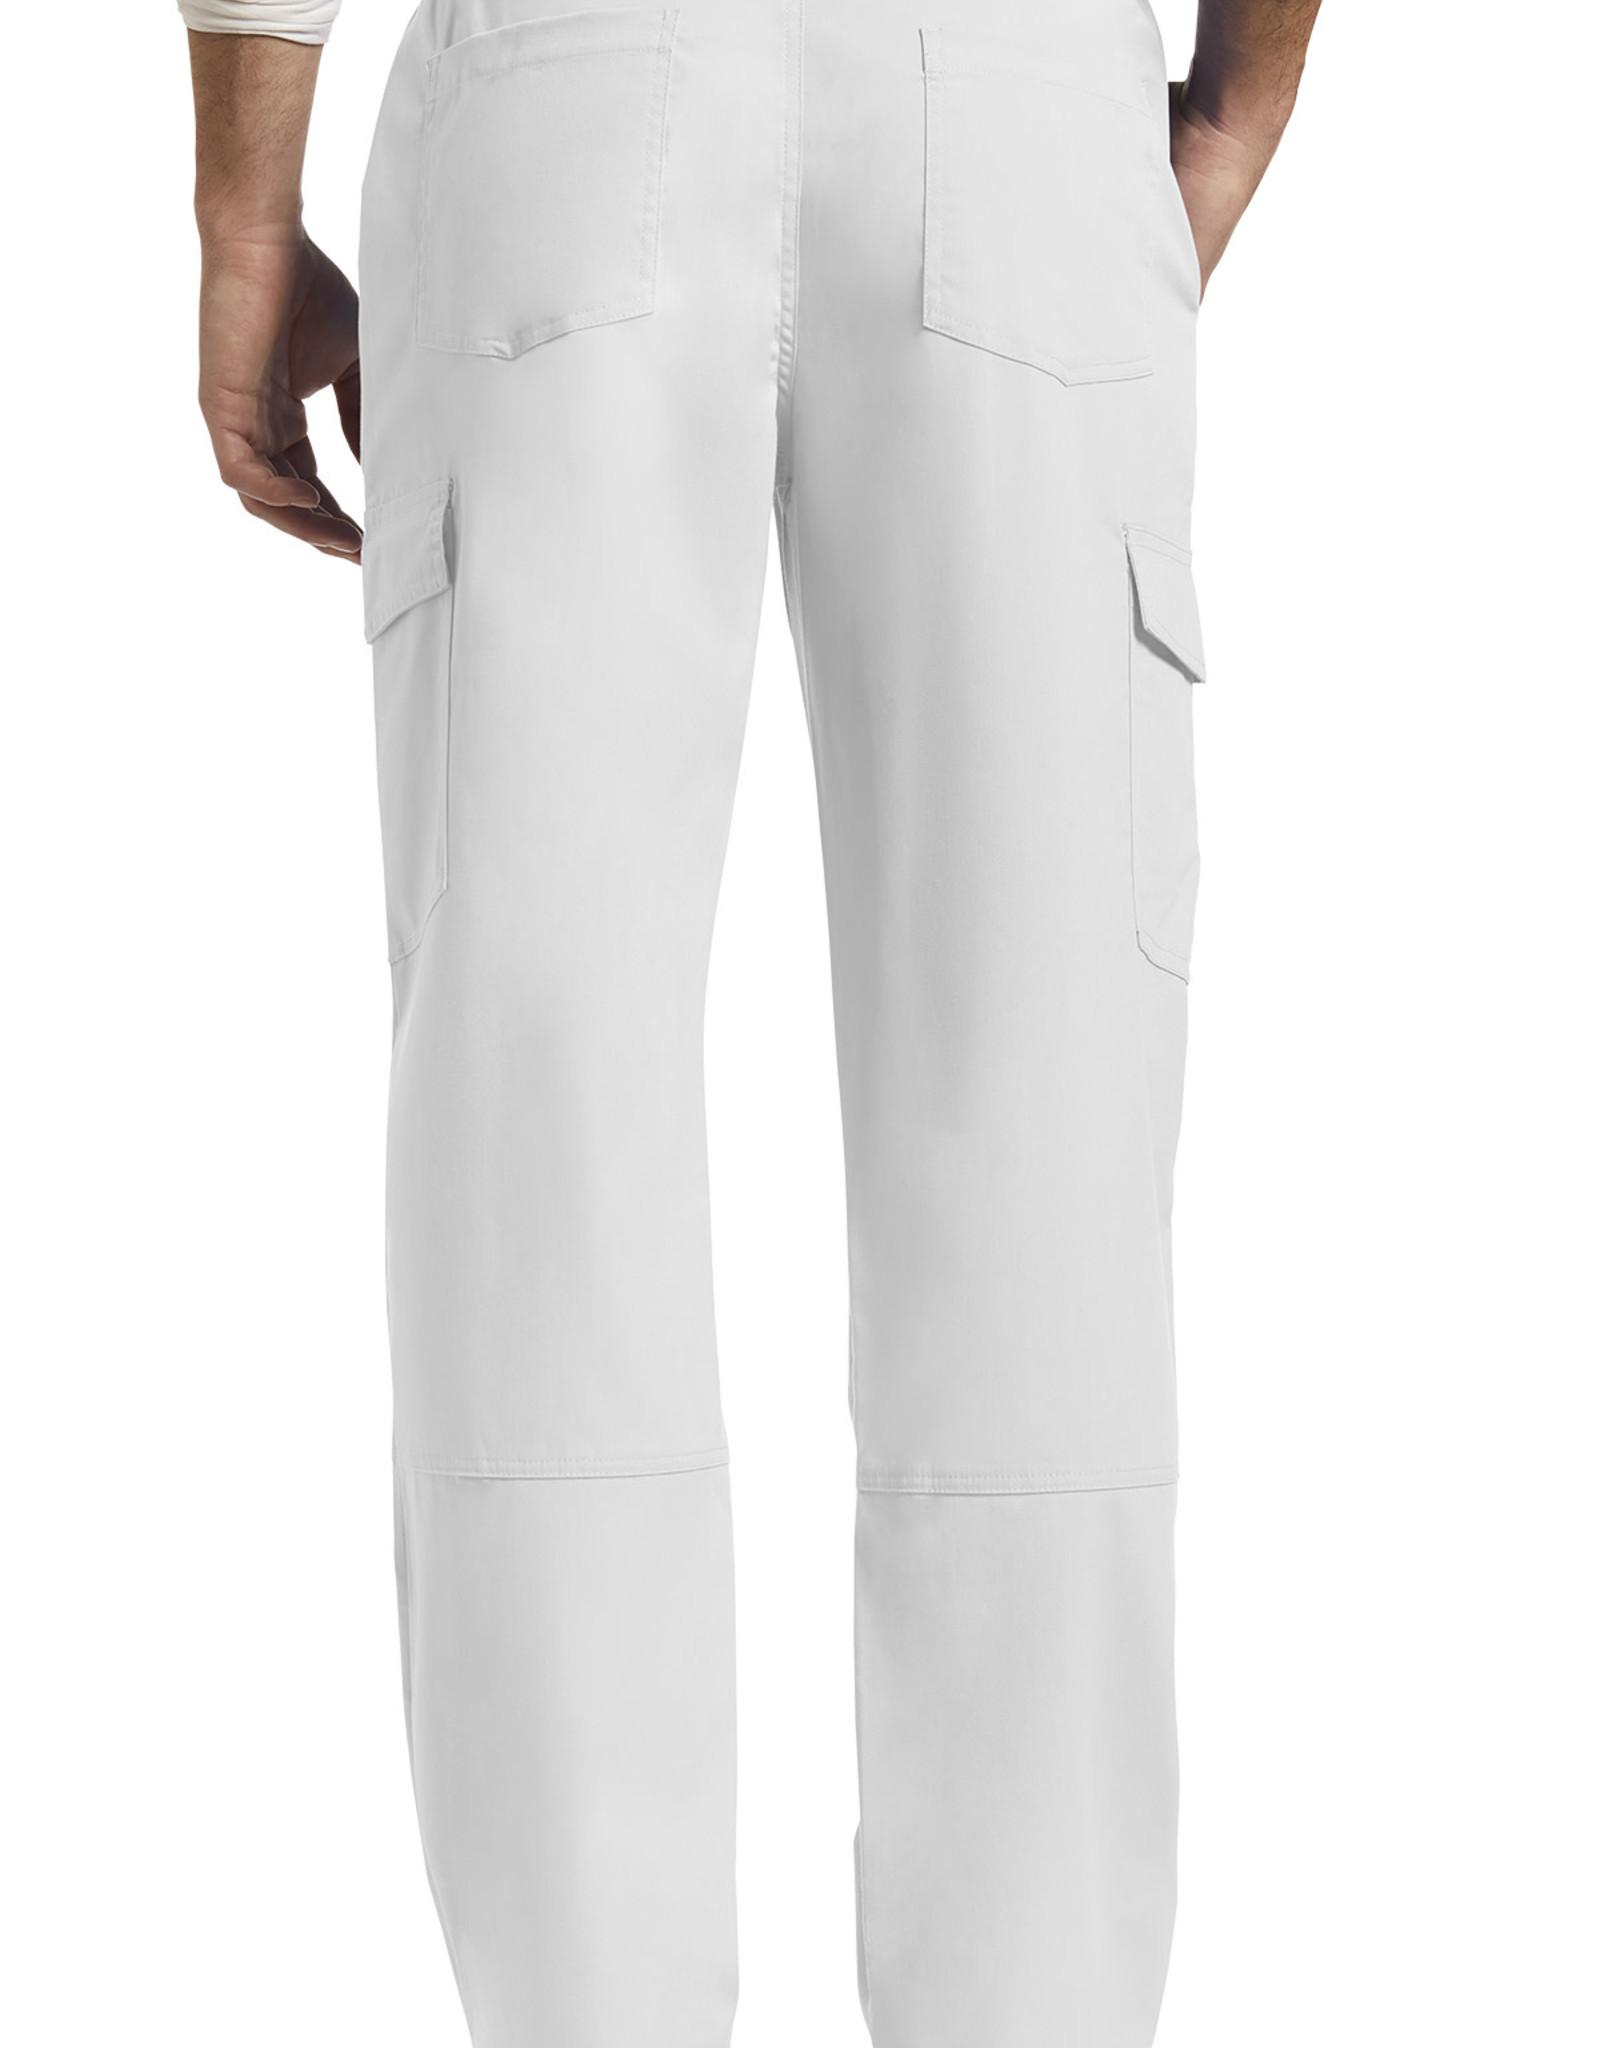 White Cross Pantalon White Cross Multi Poches 228